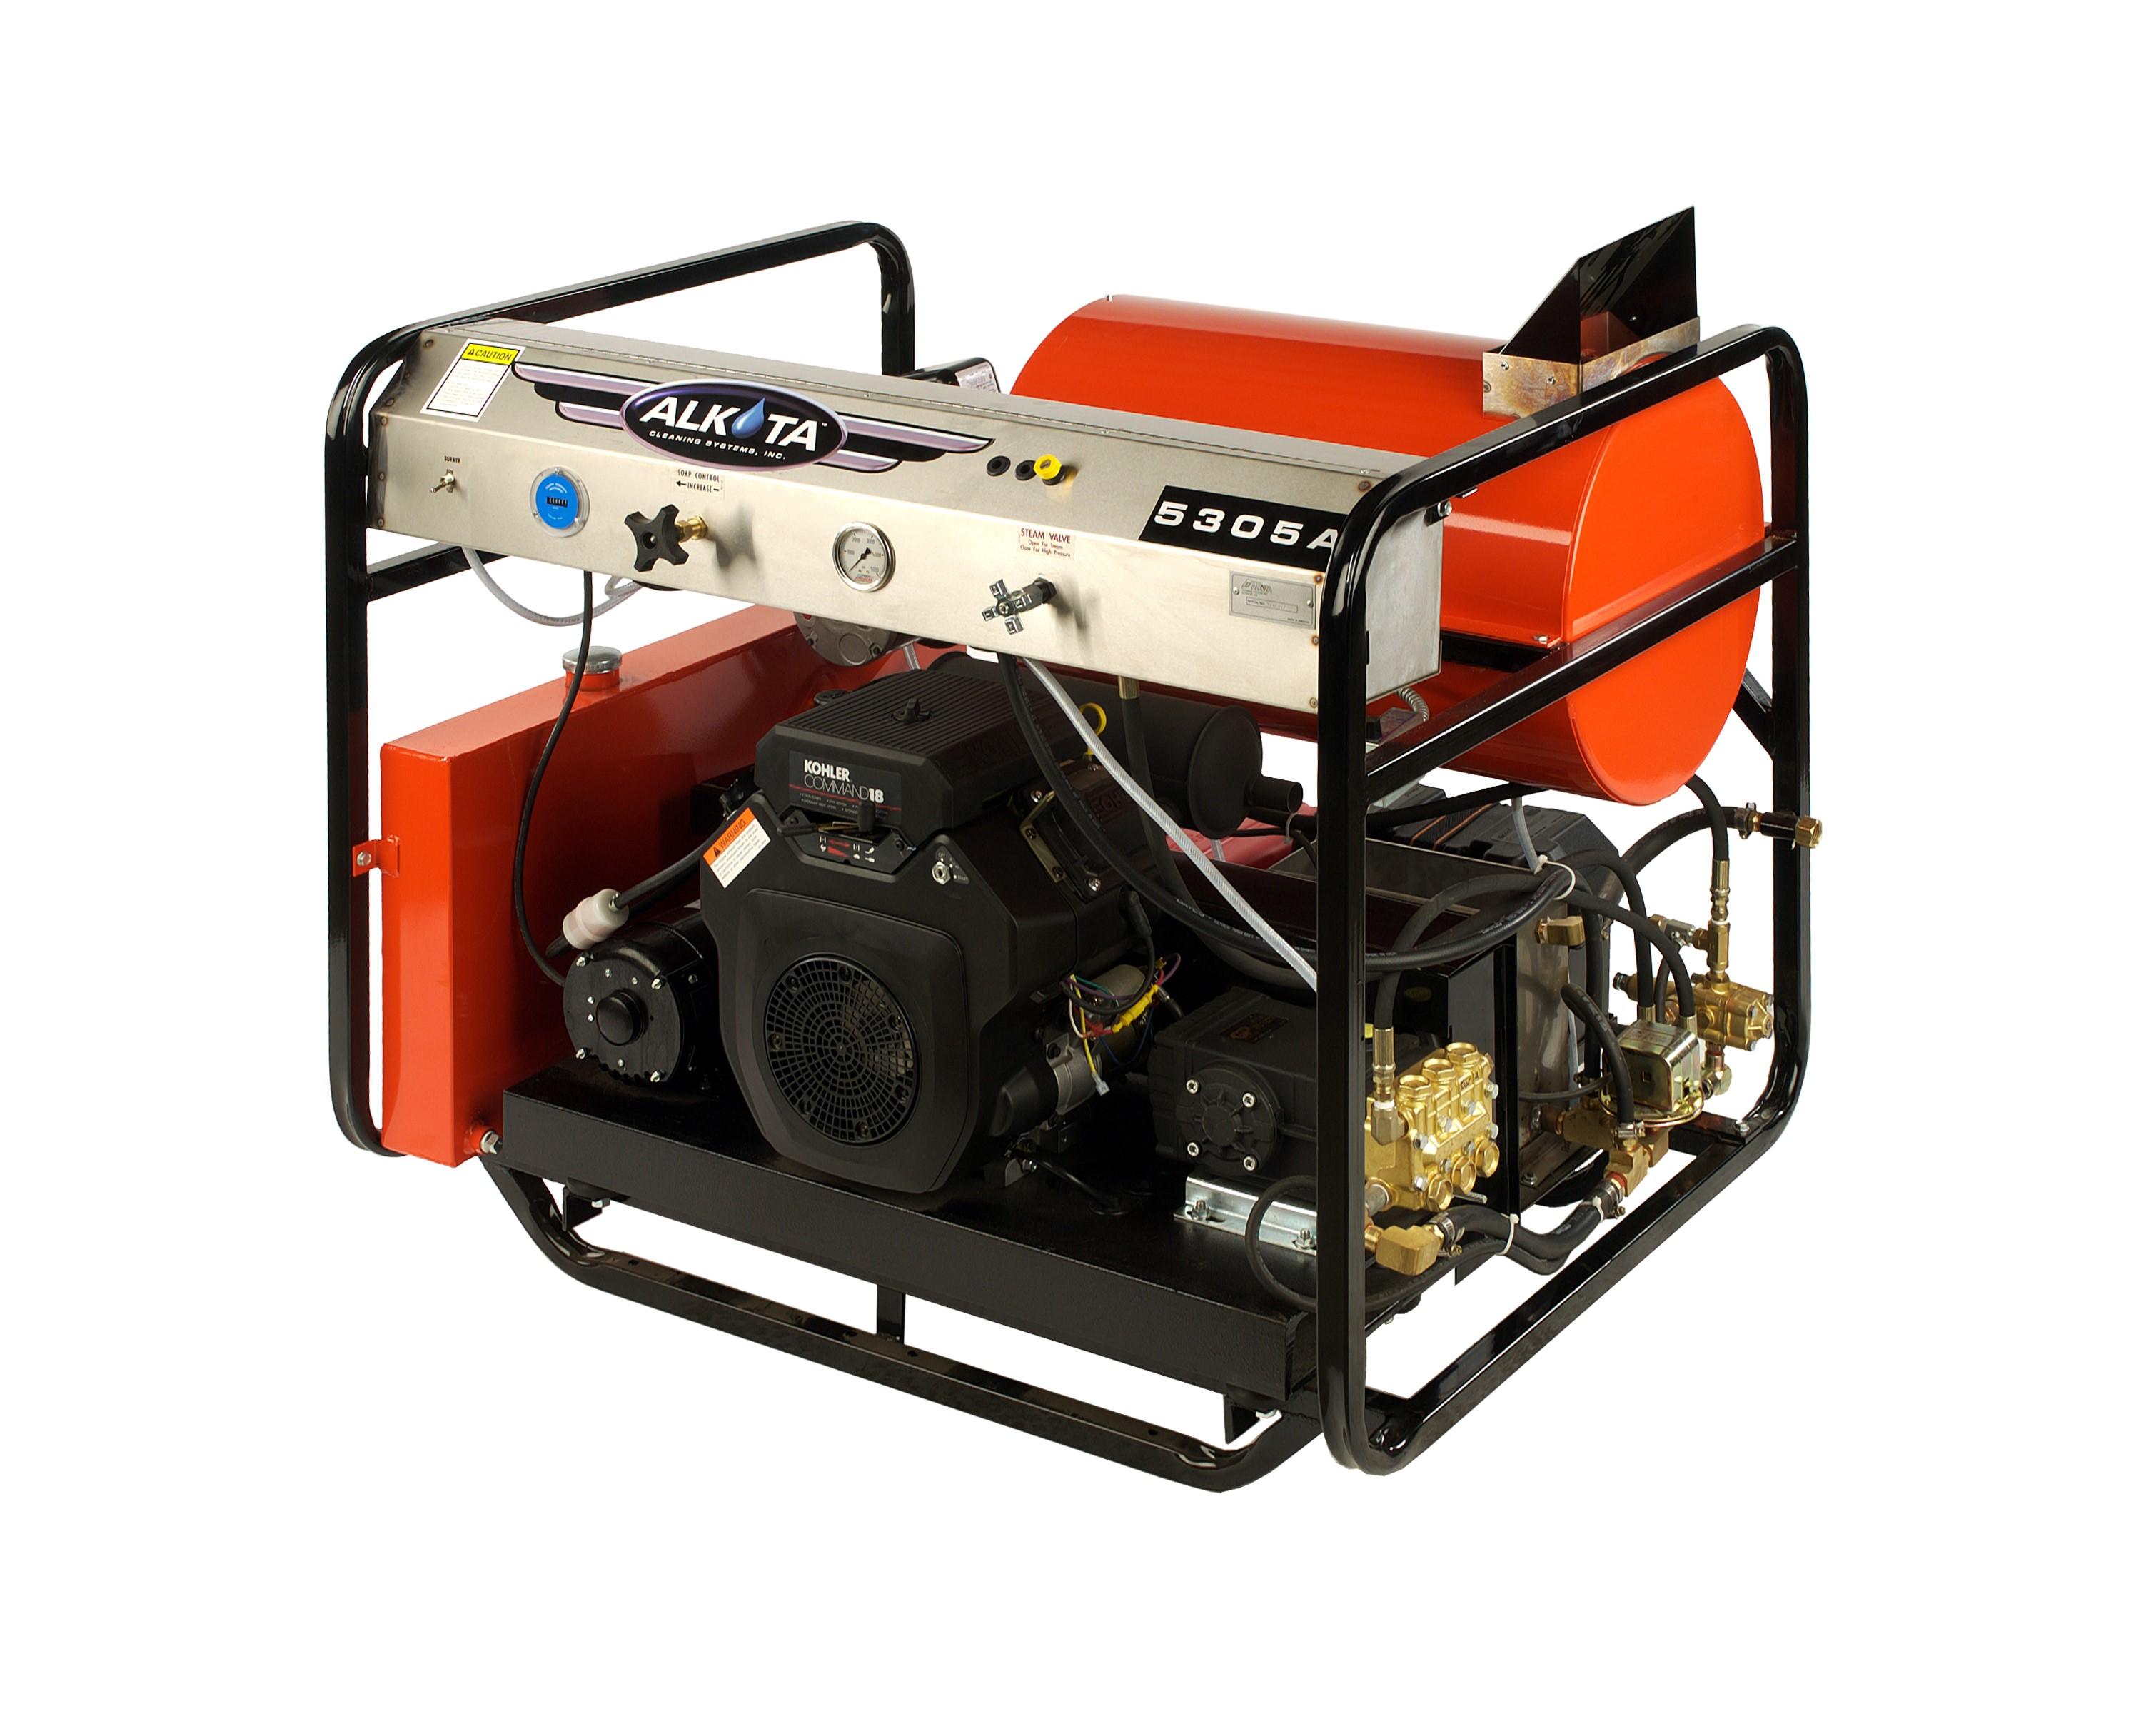 pressure washer hot water gas engine 5305a alkota alkota cleaning alkota wiring diagram [ 3020 x 2432 Pixel ]